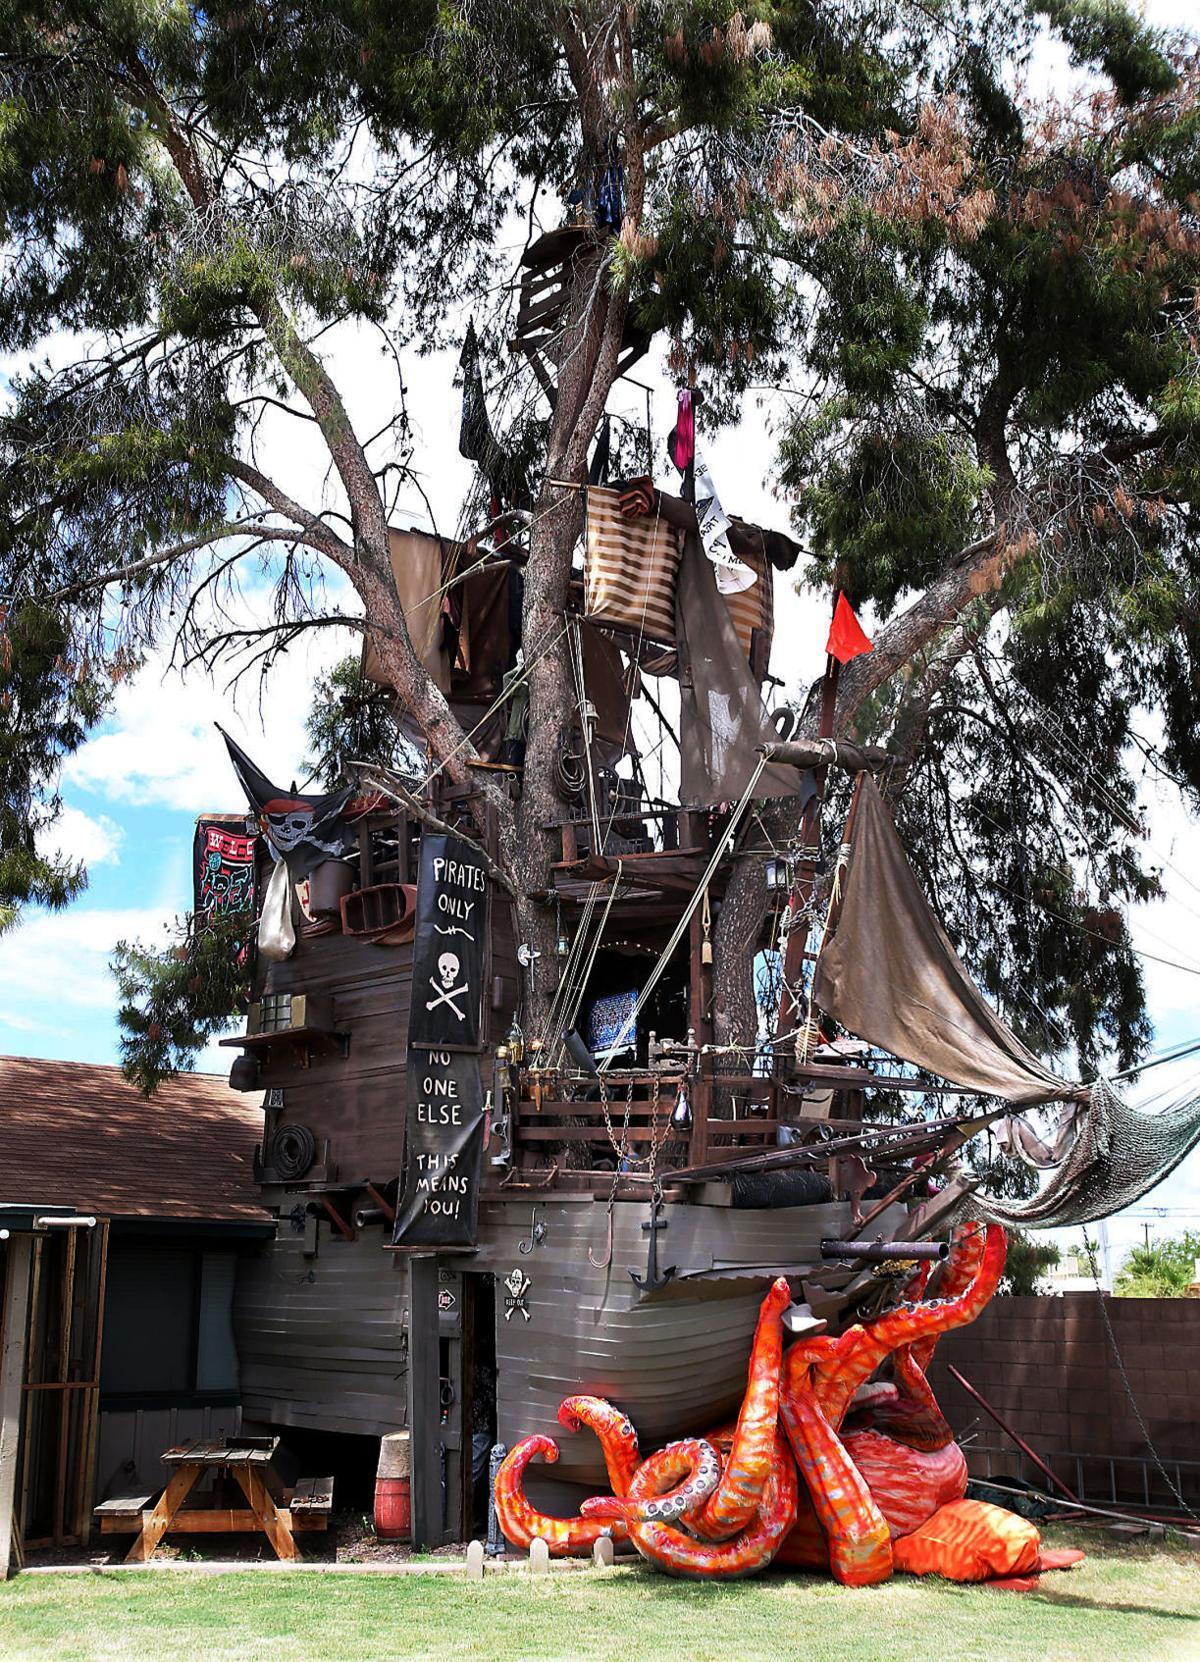 Disney movie inspires Casa Grande man to build pirate ship ...